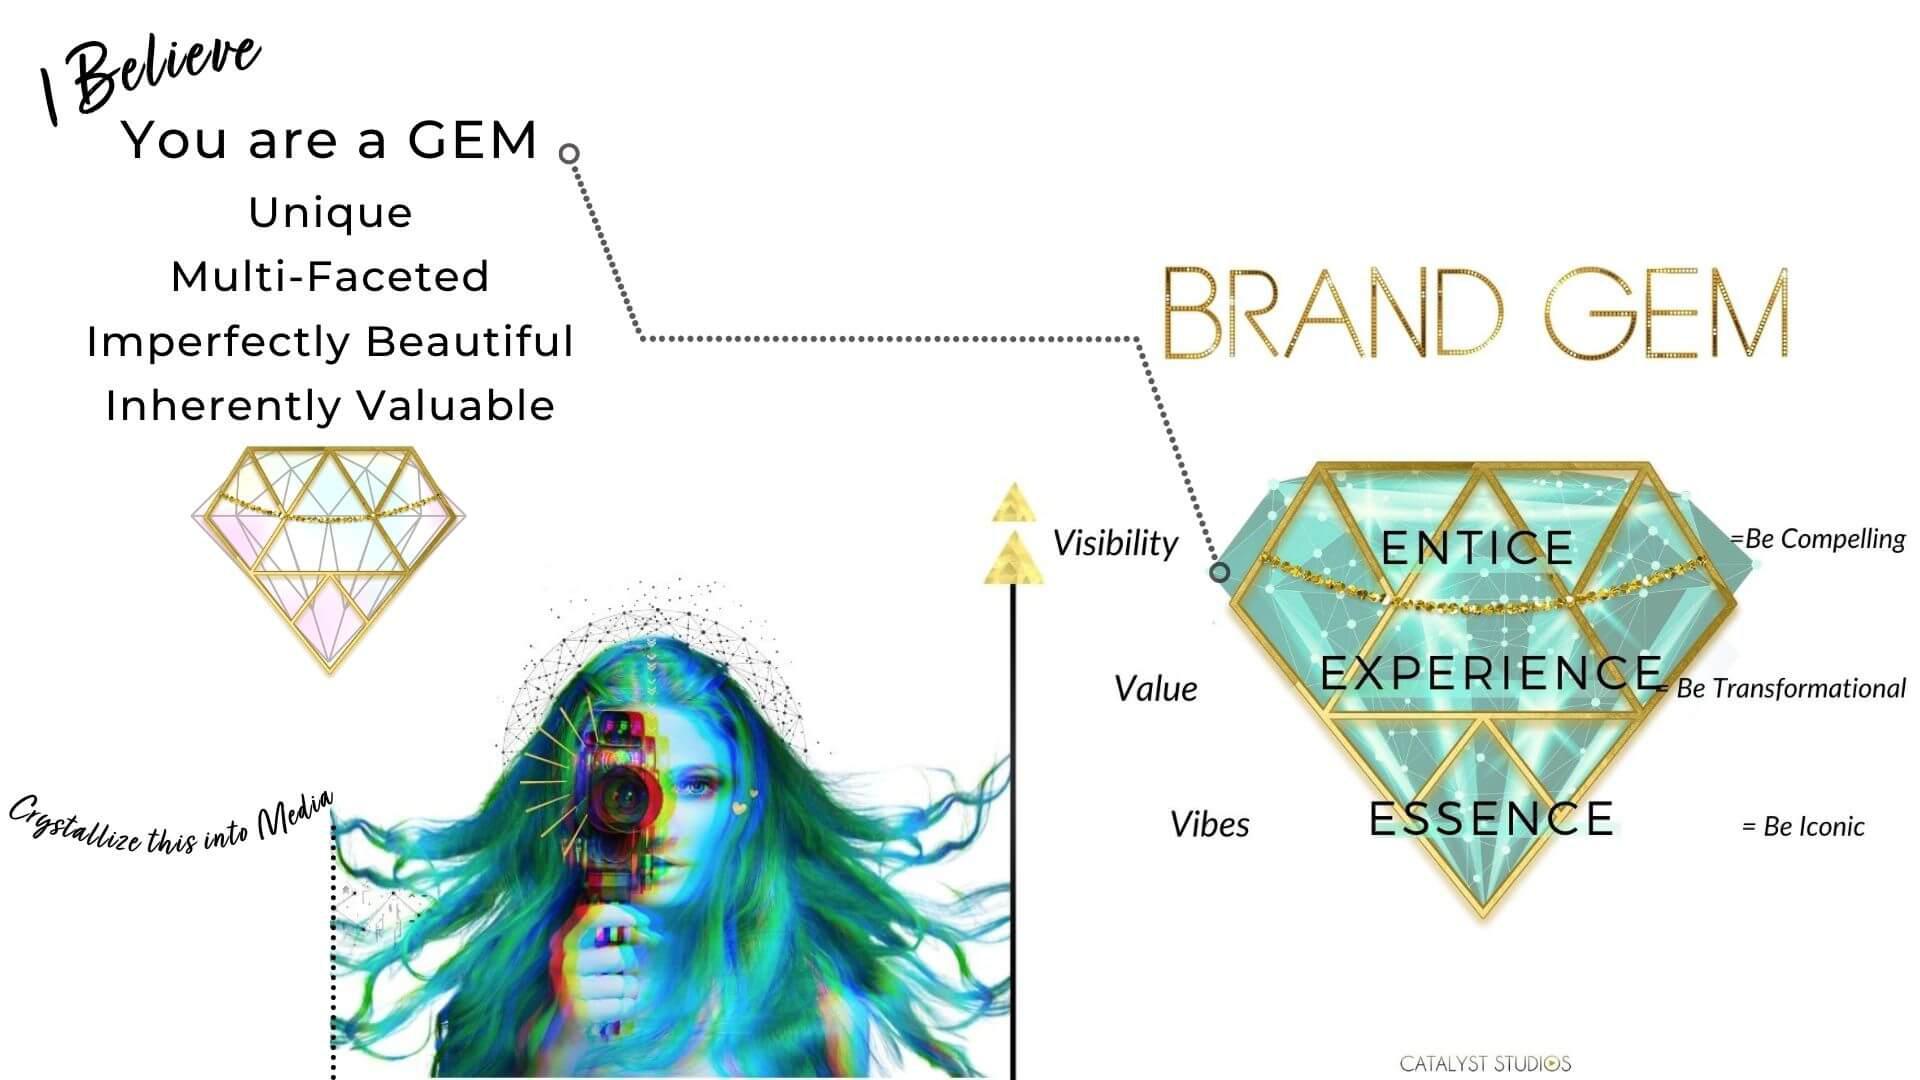 Brand Gem holistic methodology - You are a Multi Faceted GEM